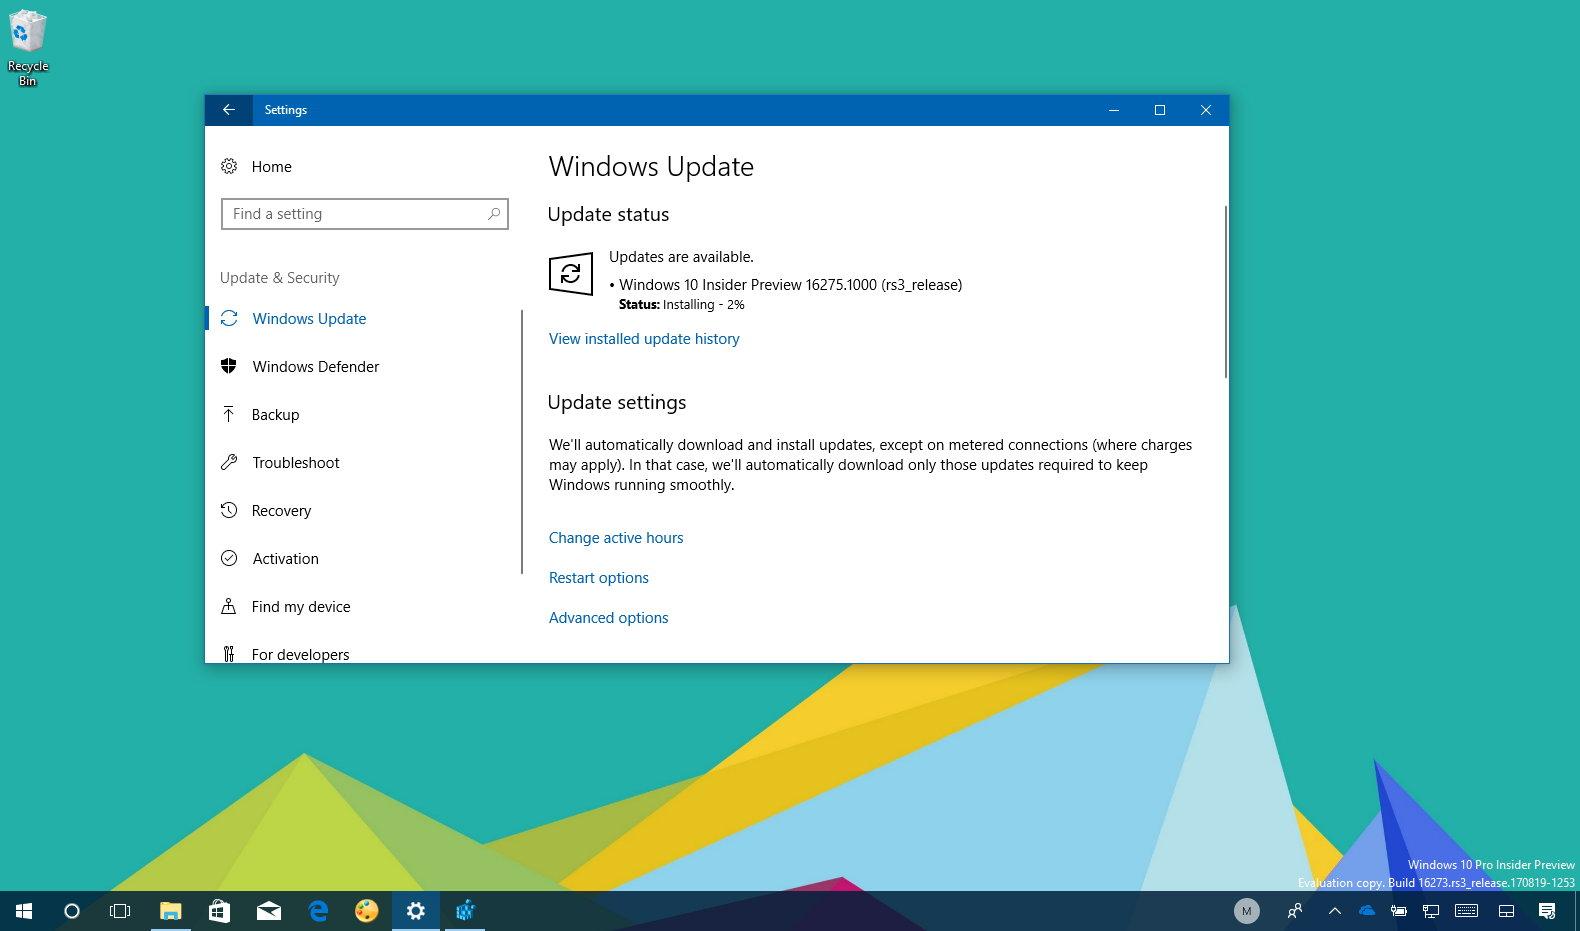 Windows 10 build 16275